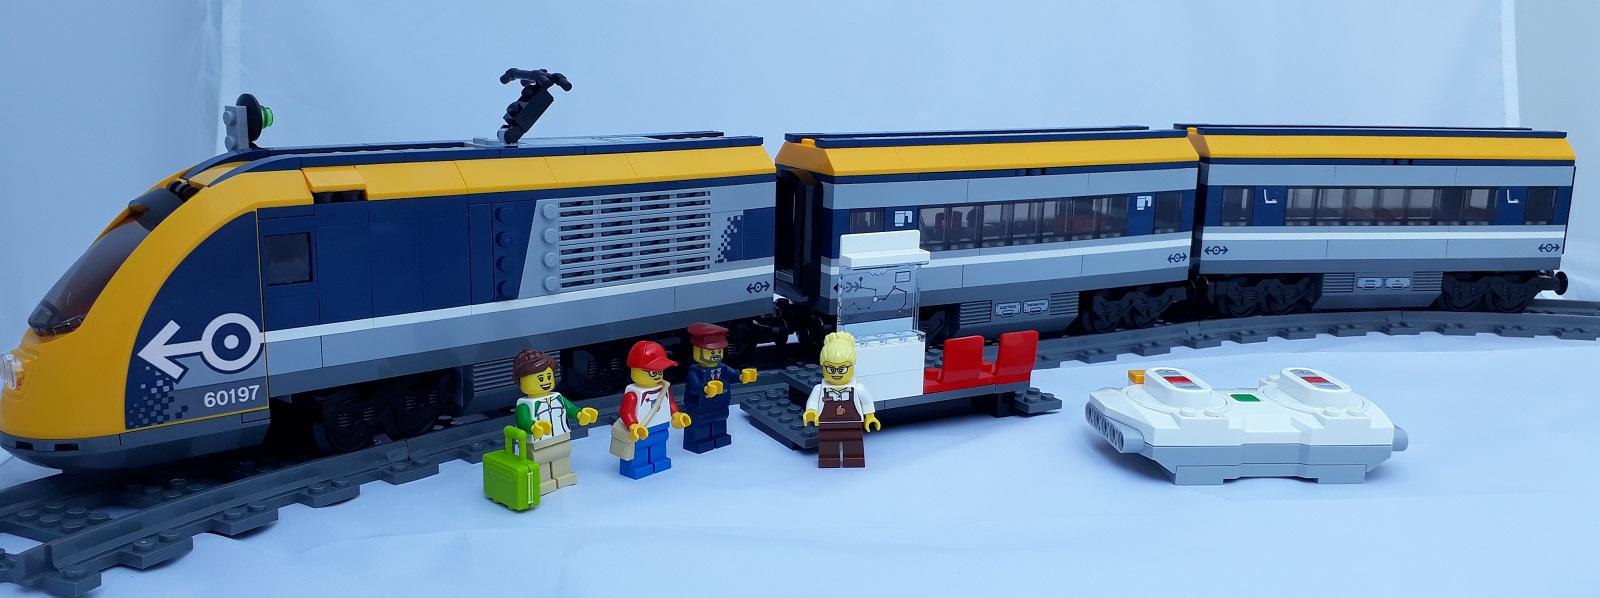 60197 RevueRevue Passager Train Du Freelug EWD92HI